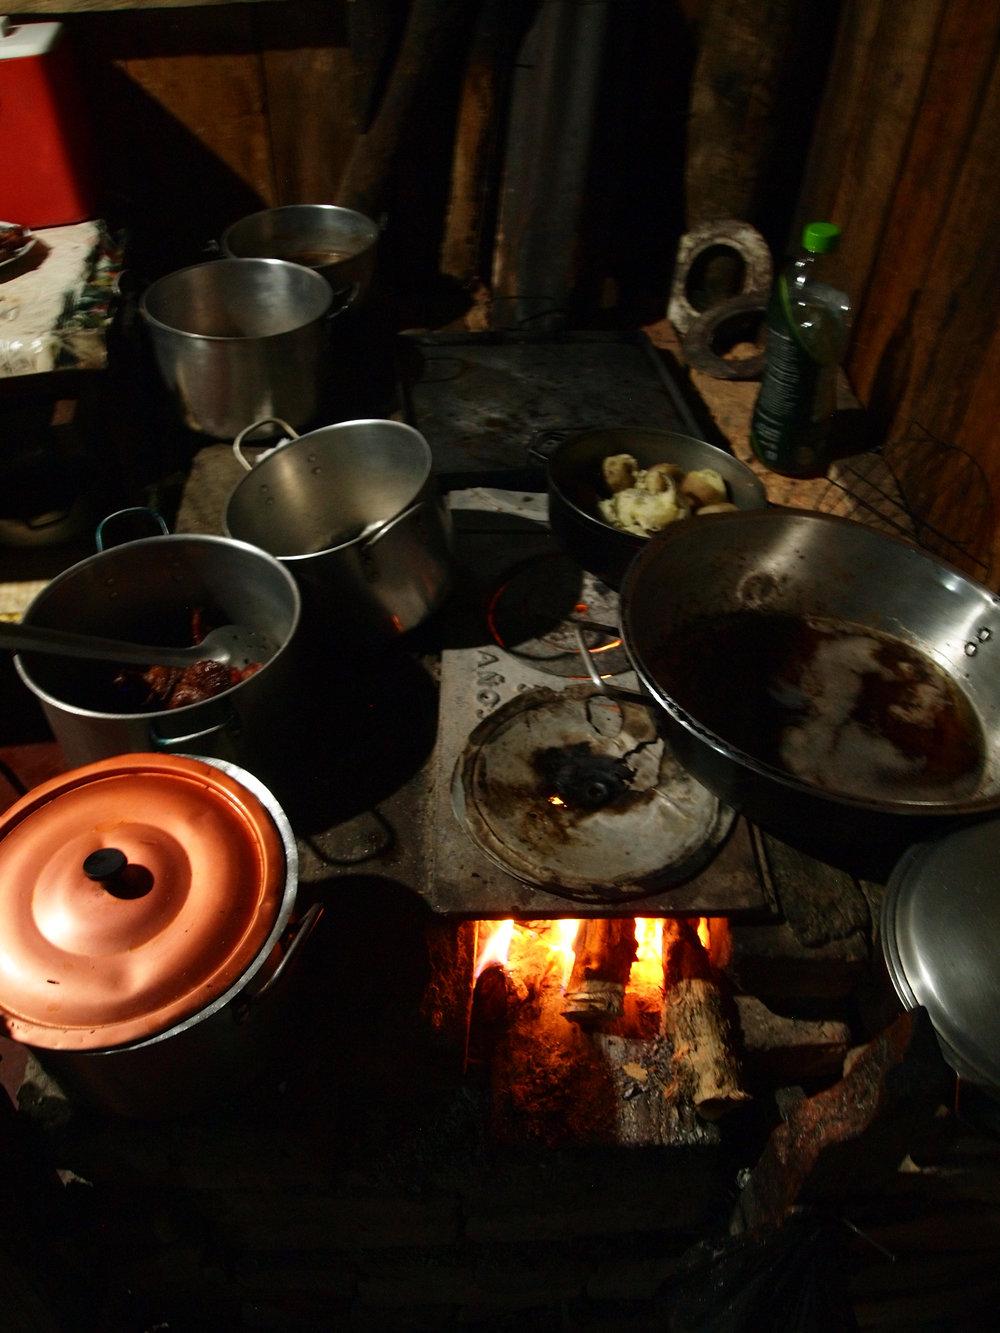 Dinner cooked by Maria Bercelia Martinez, La Marimba, Acevedo, Huila